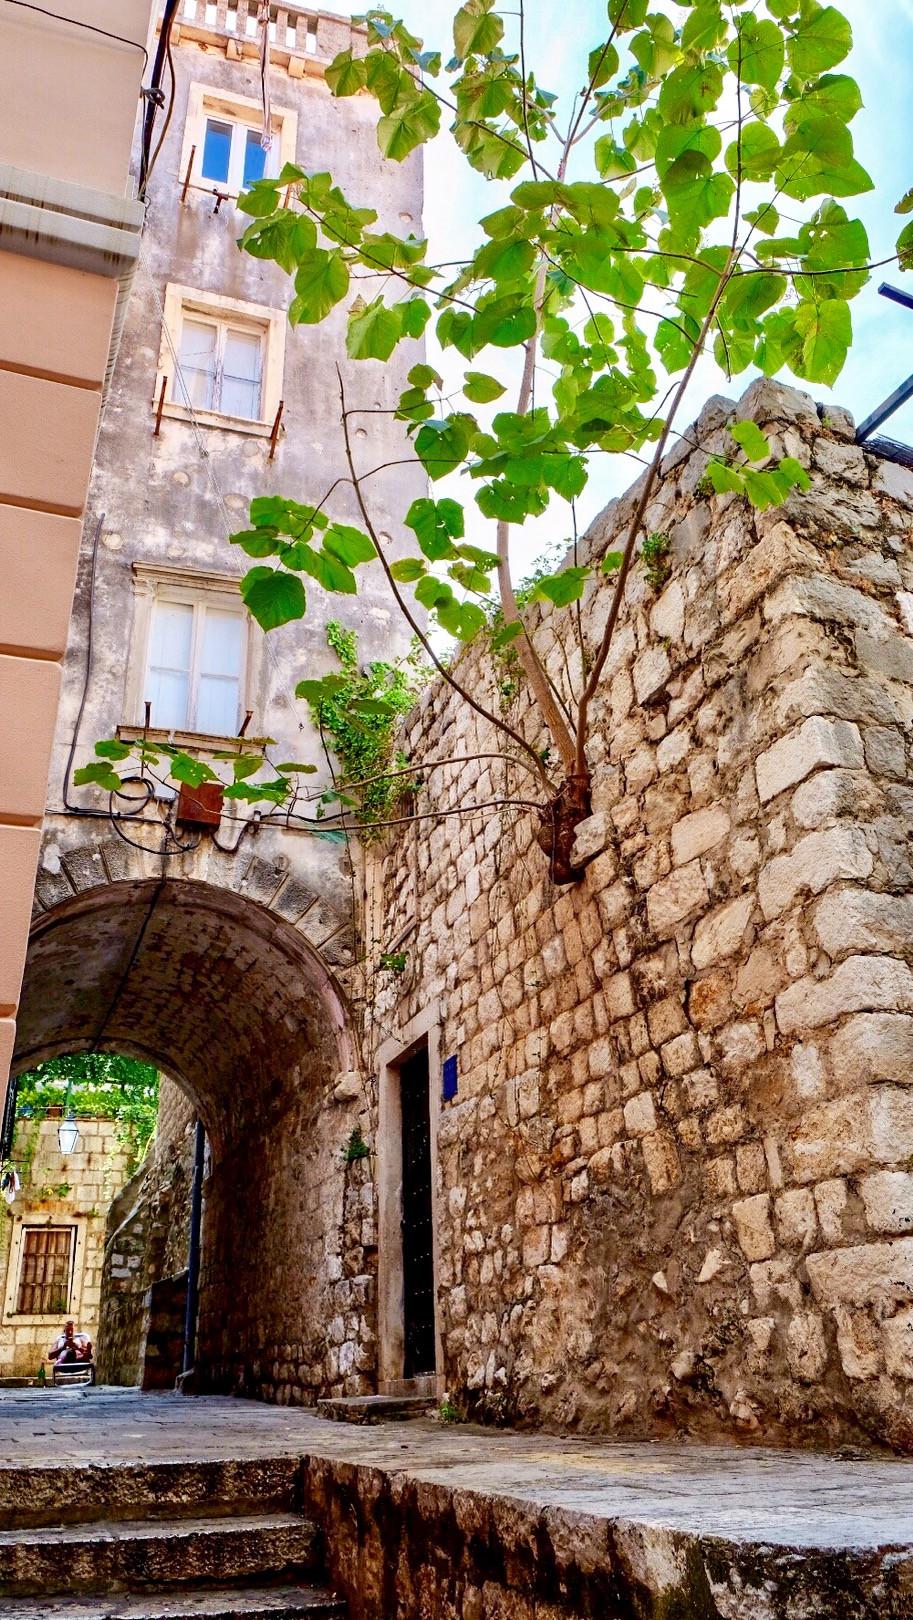 Streets of Dubrovnik Croatia